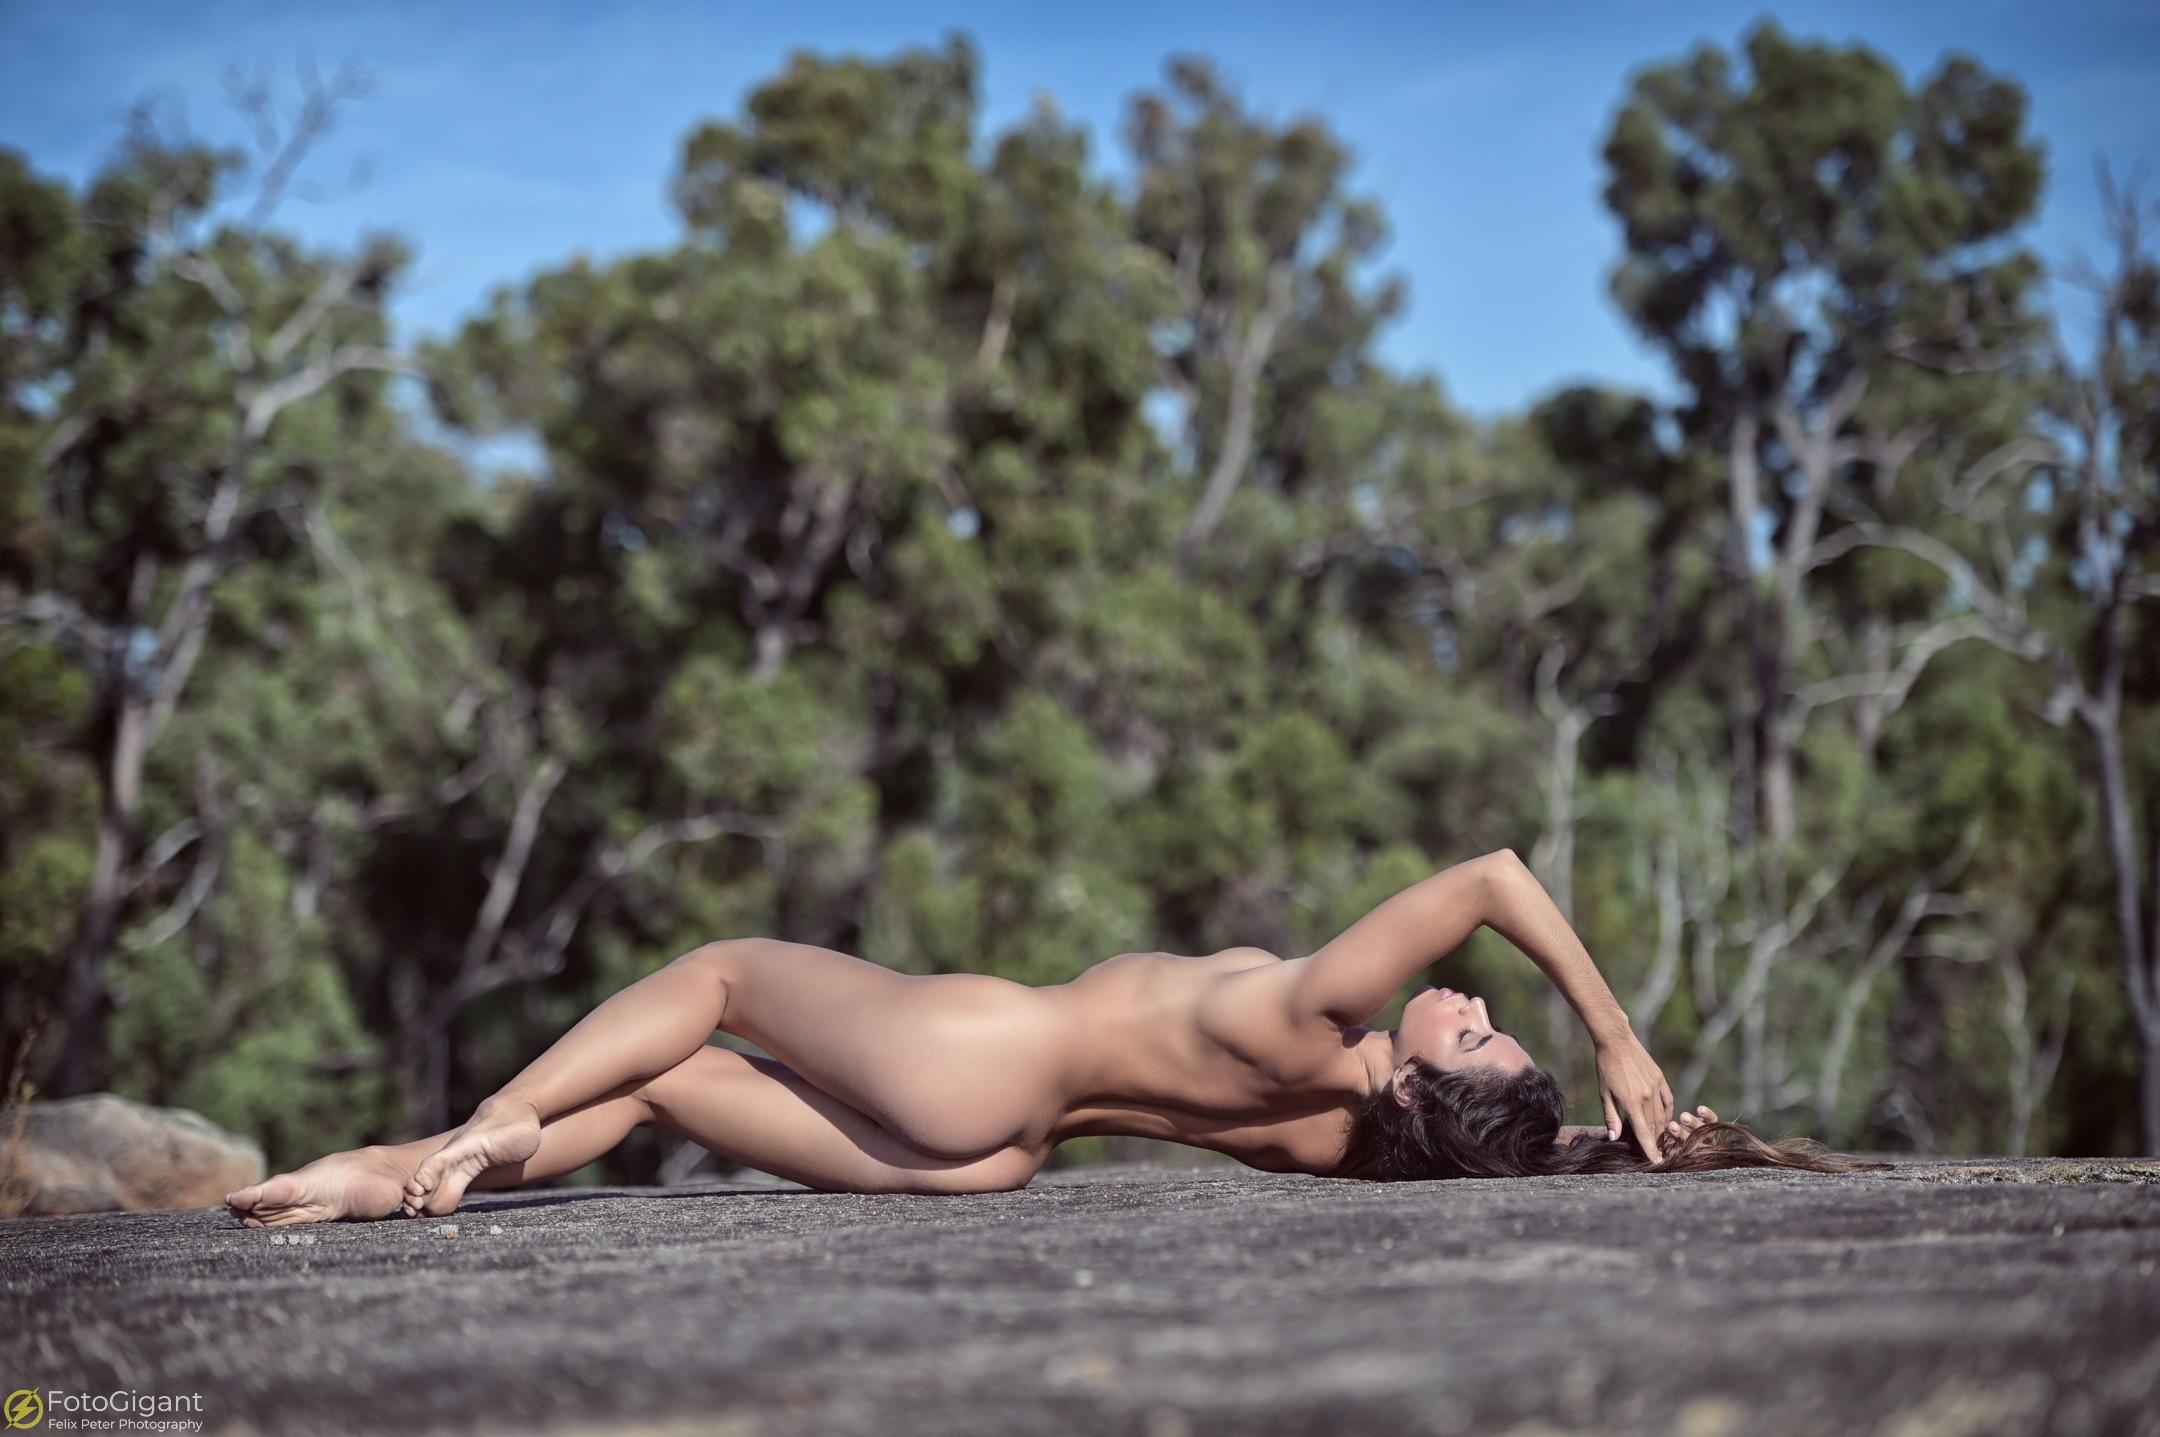 NudeArt_Aktfotografie_Eva-Luna_20.jpg